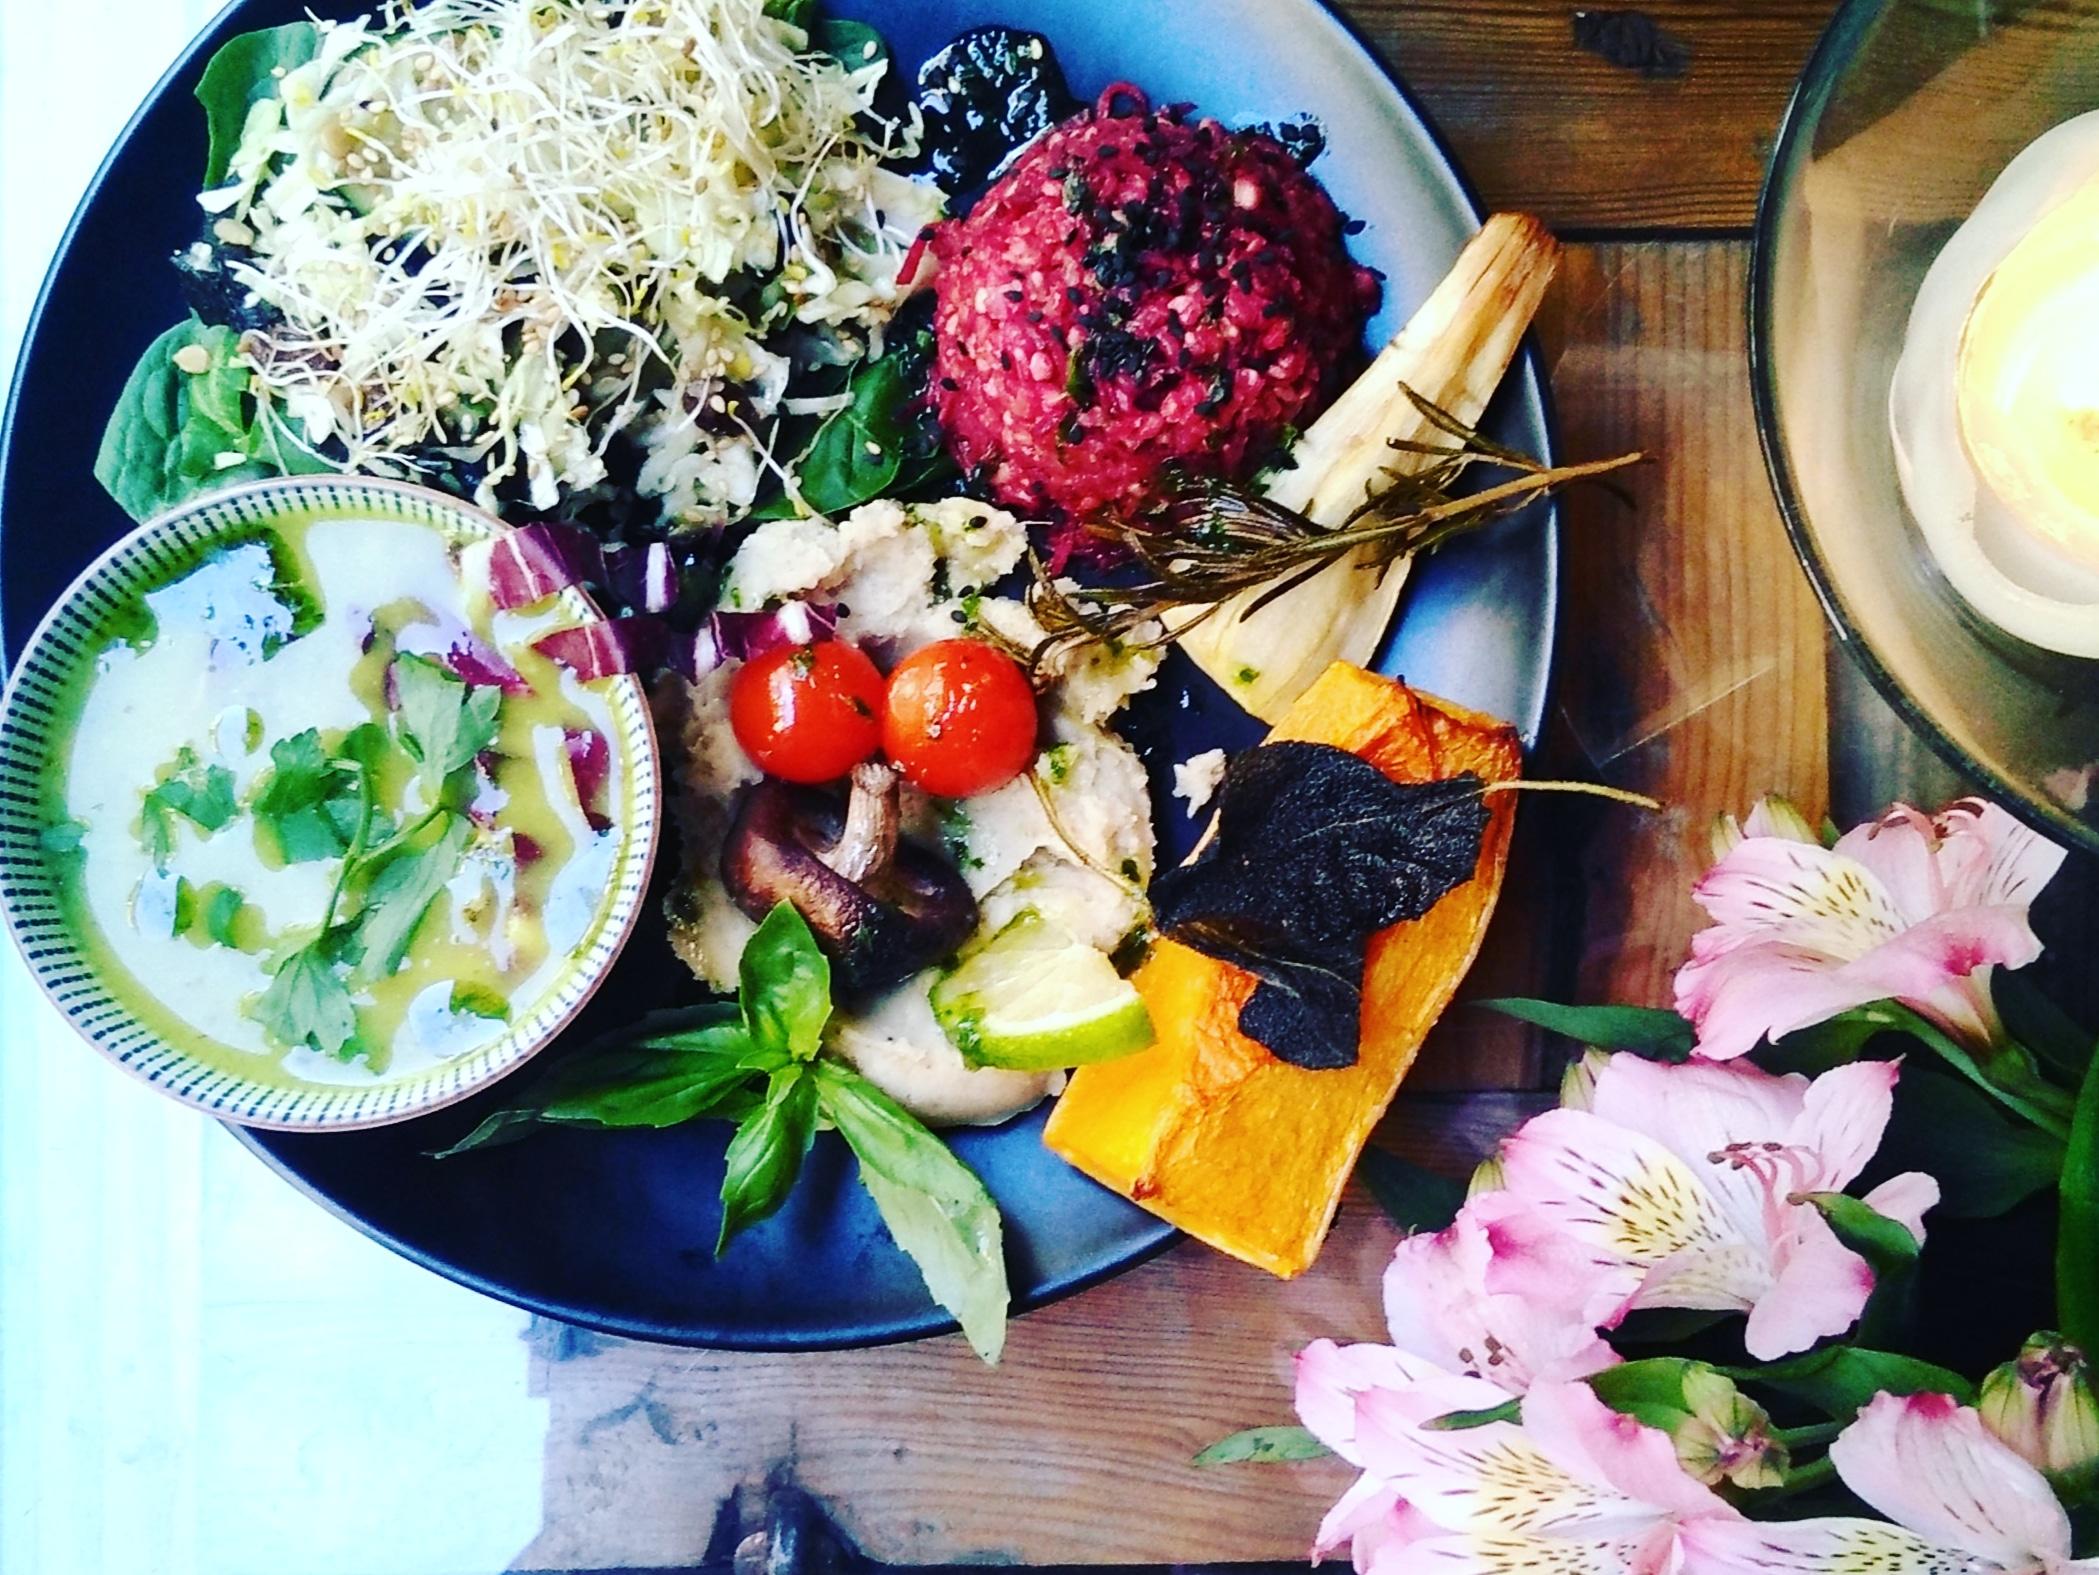 Mejores restaurantes veganos y vegetarianos de Madrid - Tiyoweh